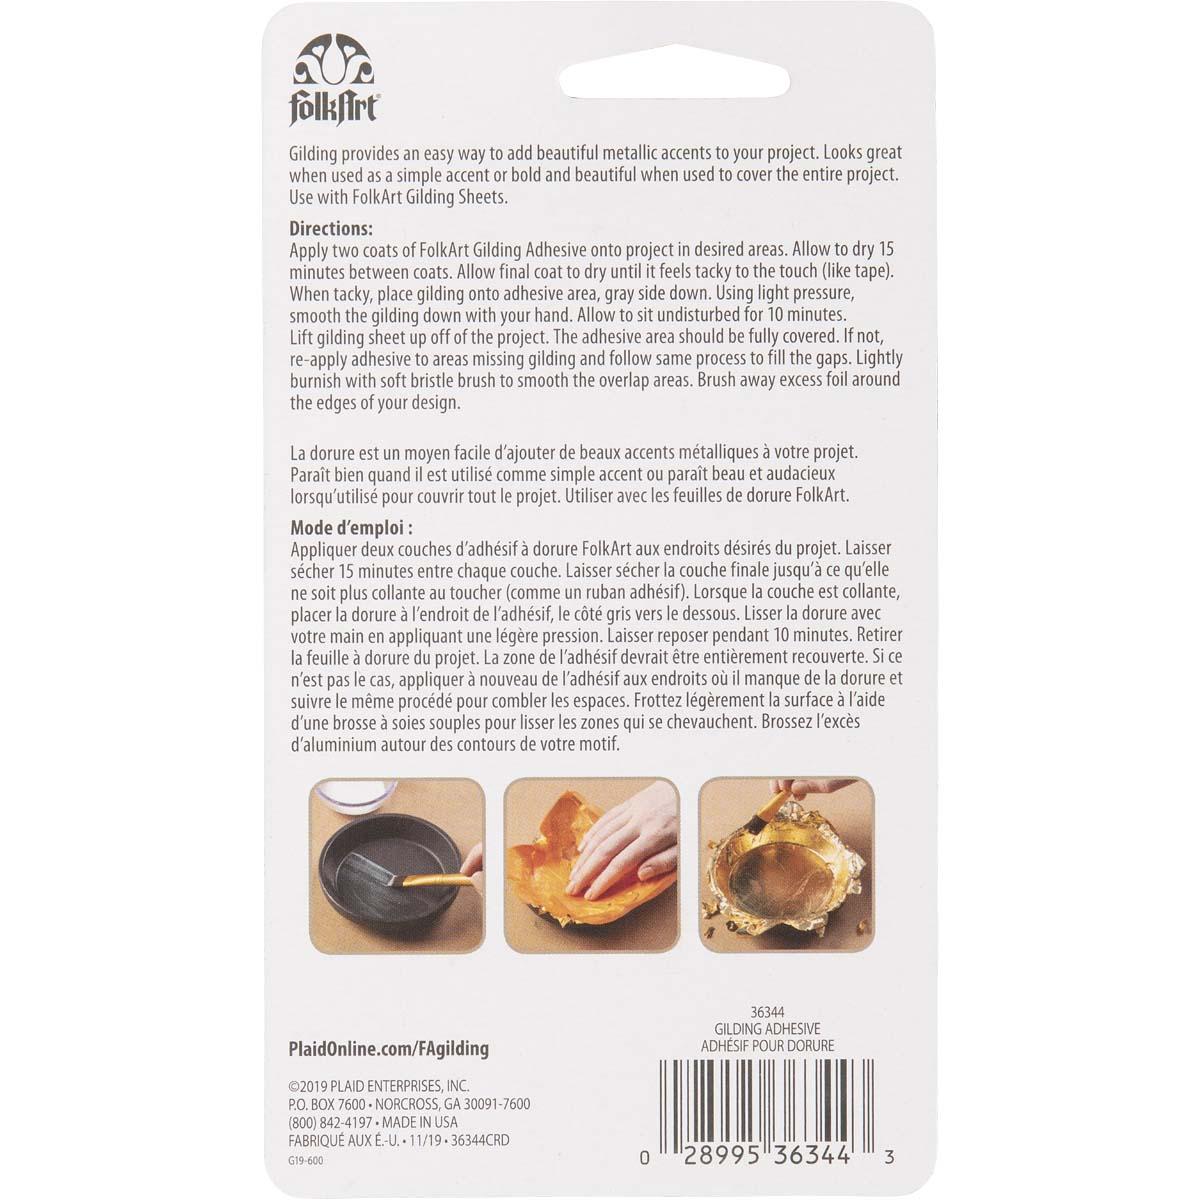 FolkArt ® Gilding Adhesive, 2 oz. - 36344